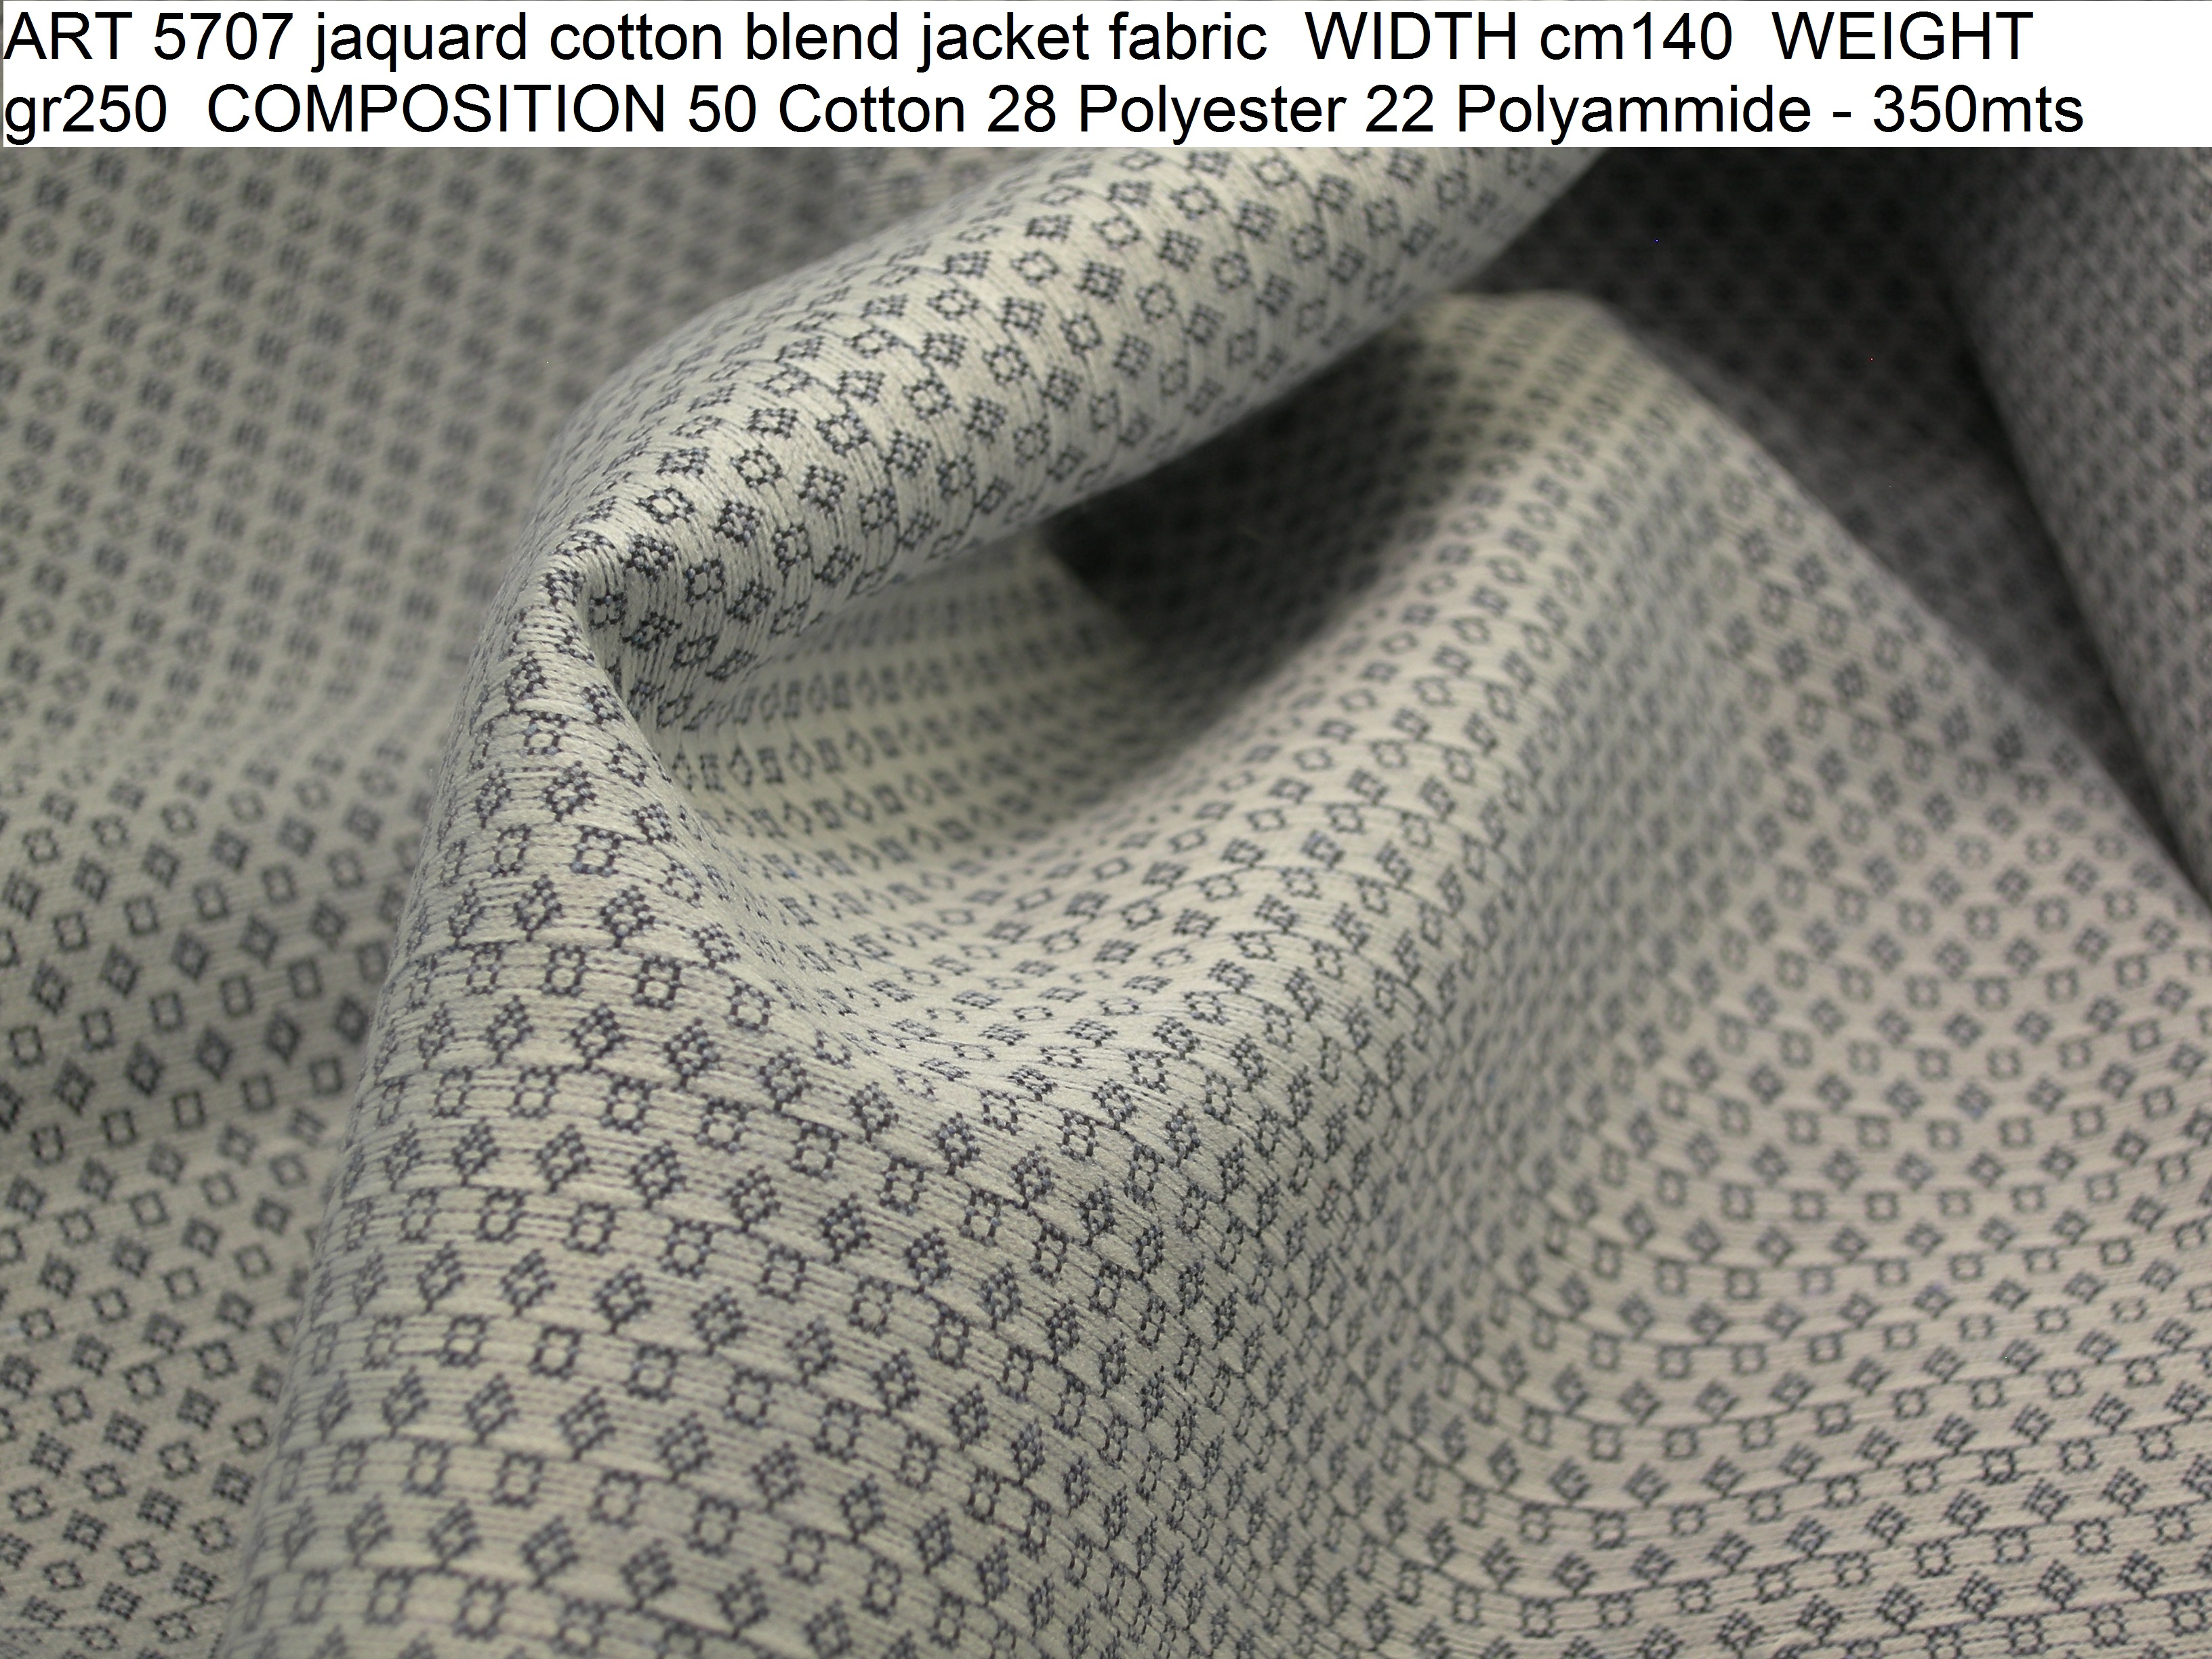 ART 5707 jaquard cotton blend jacket fabric WIDTH cm140 WEIGHT gr250 COMPOSITION 50 Cotton 28 Polyester 22 Polyammide - 350mts